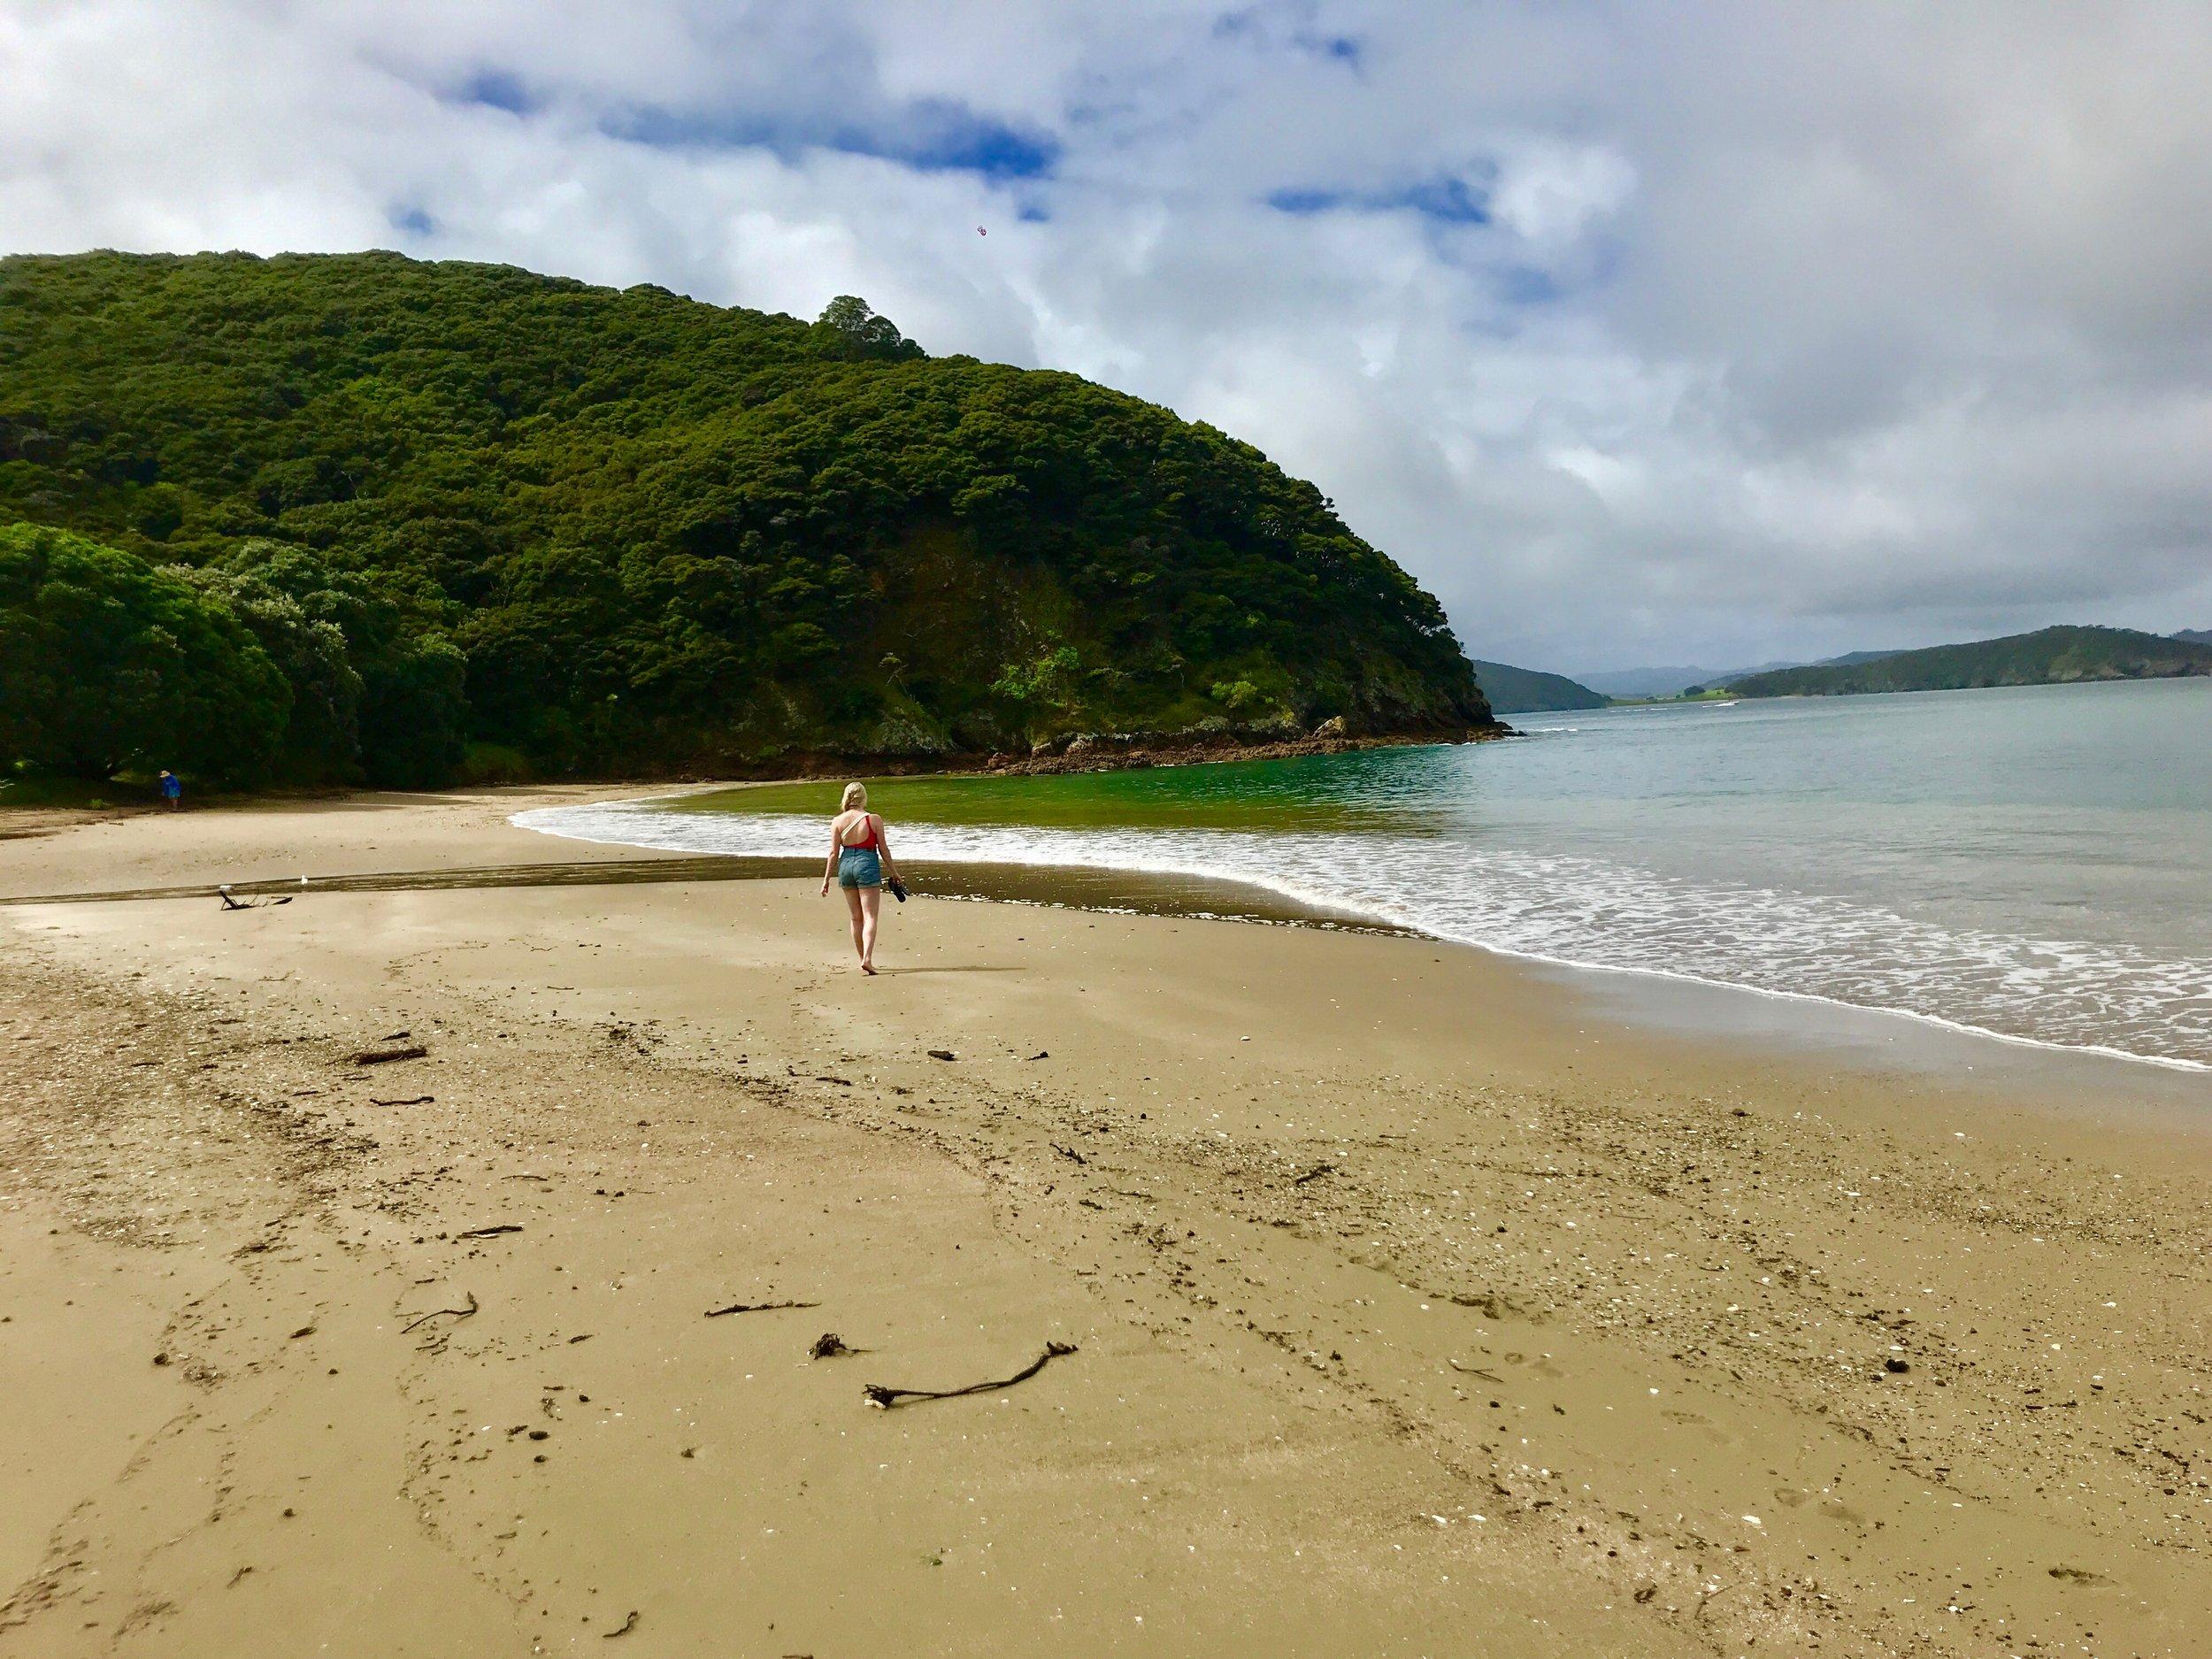 hayley renee smith_new zealand_bay of islands.jpg